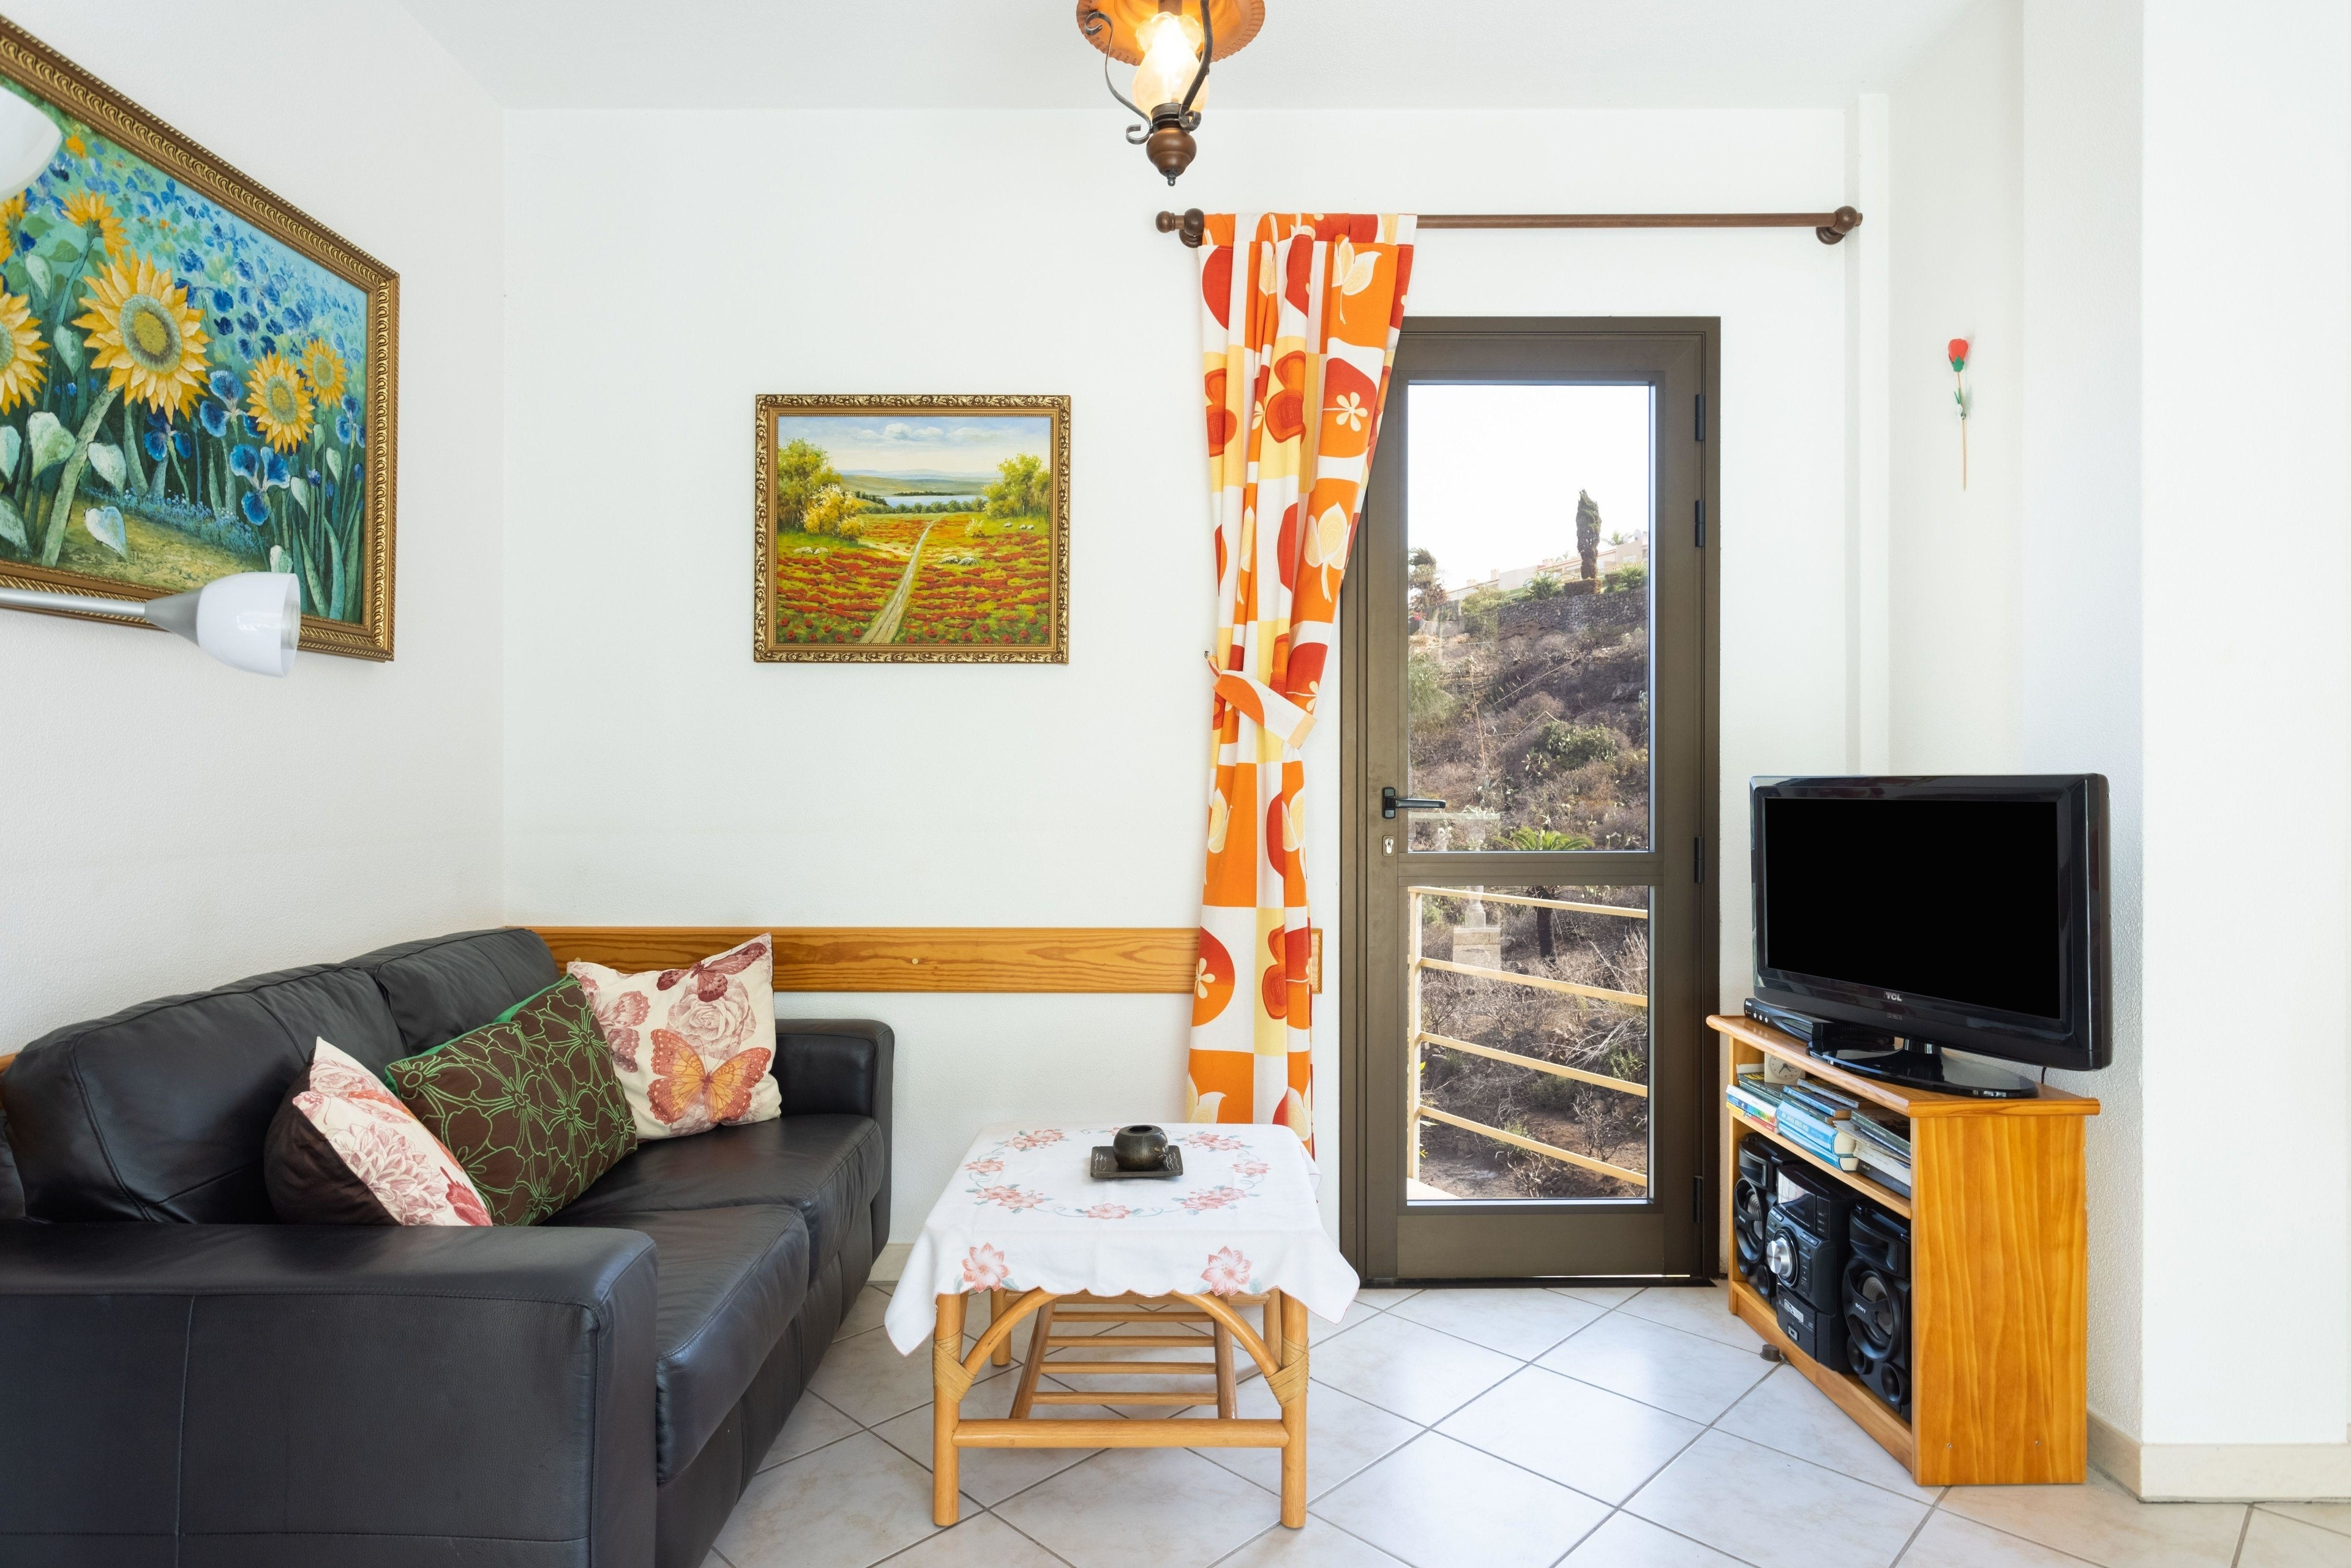 Appartement de vacances Fewo Atico Florasol, sehr ruhig direkt am Naturschutzgebiet, mit Pool, 2 Terrassen, Grill, (2492983), Santa Ursula, Ténérife, Iles Canaries, Espagne, image 2